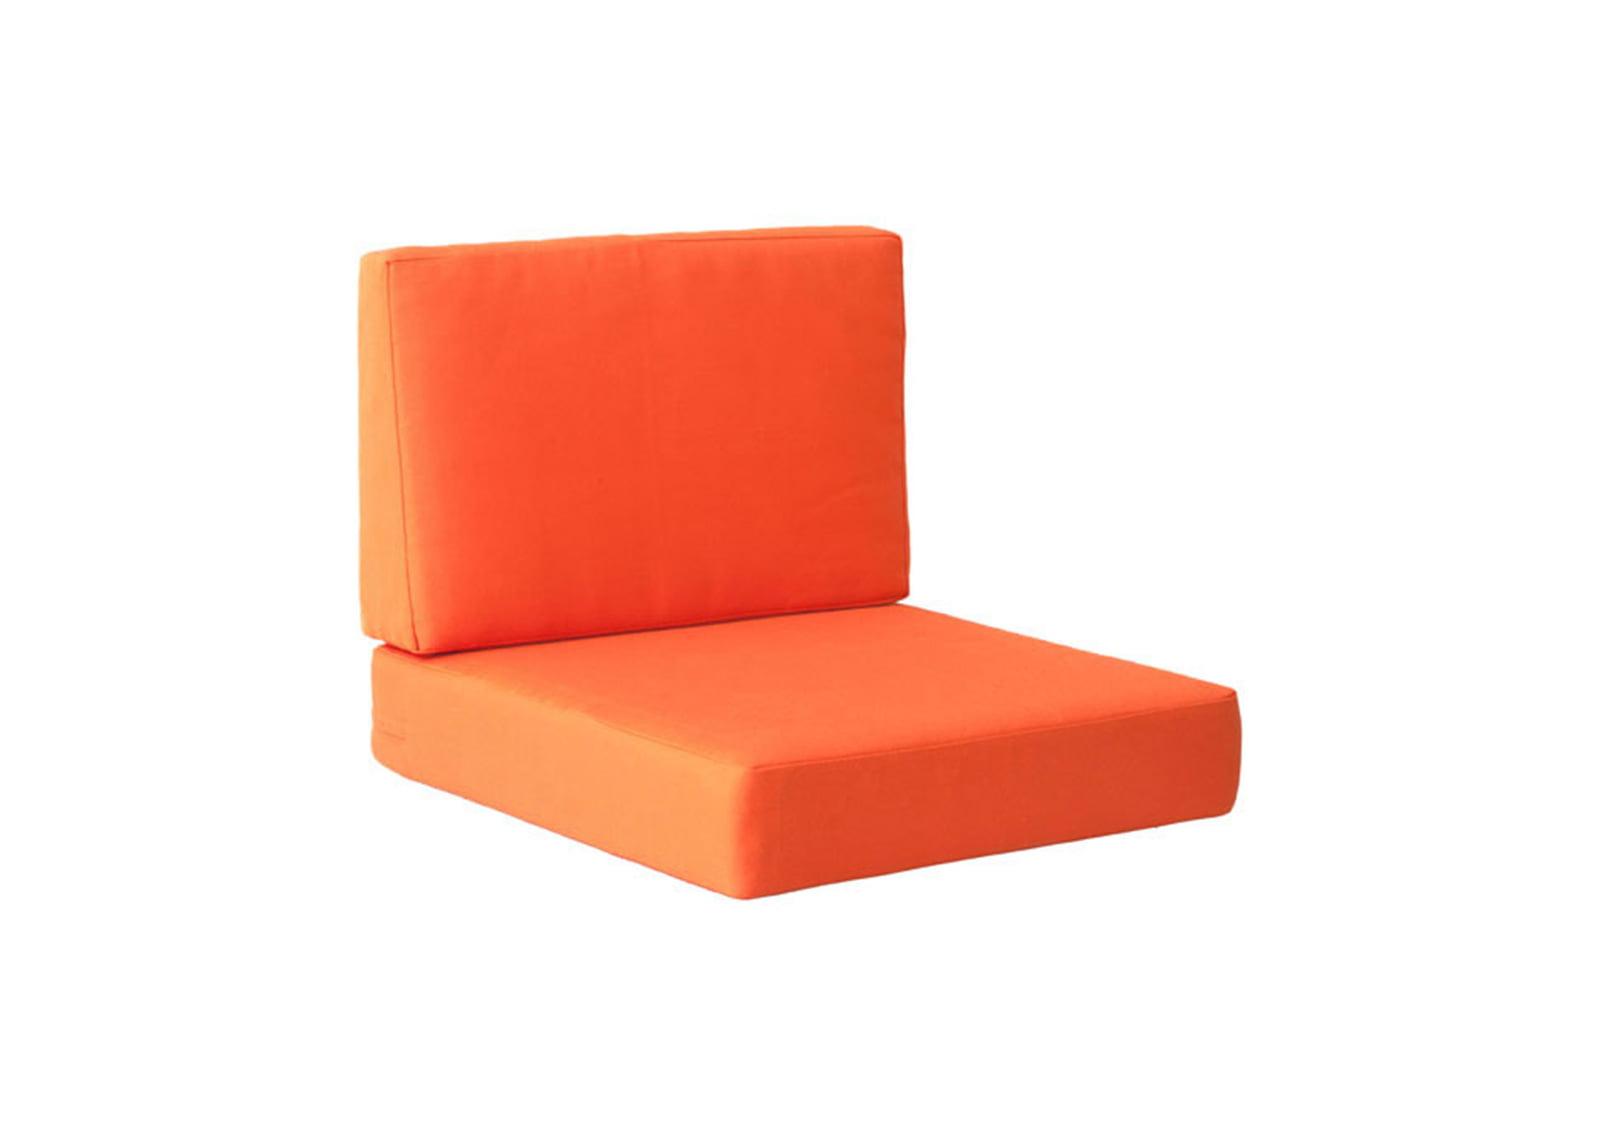 Cosmopolitan Arm Chair Cushion Orange Furnishplus